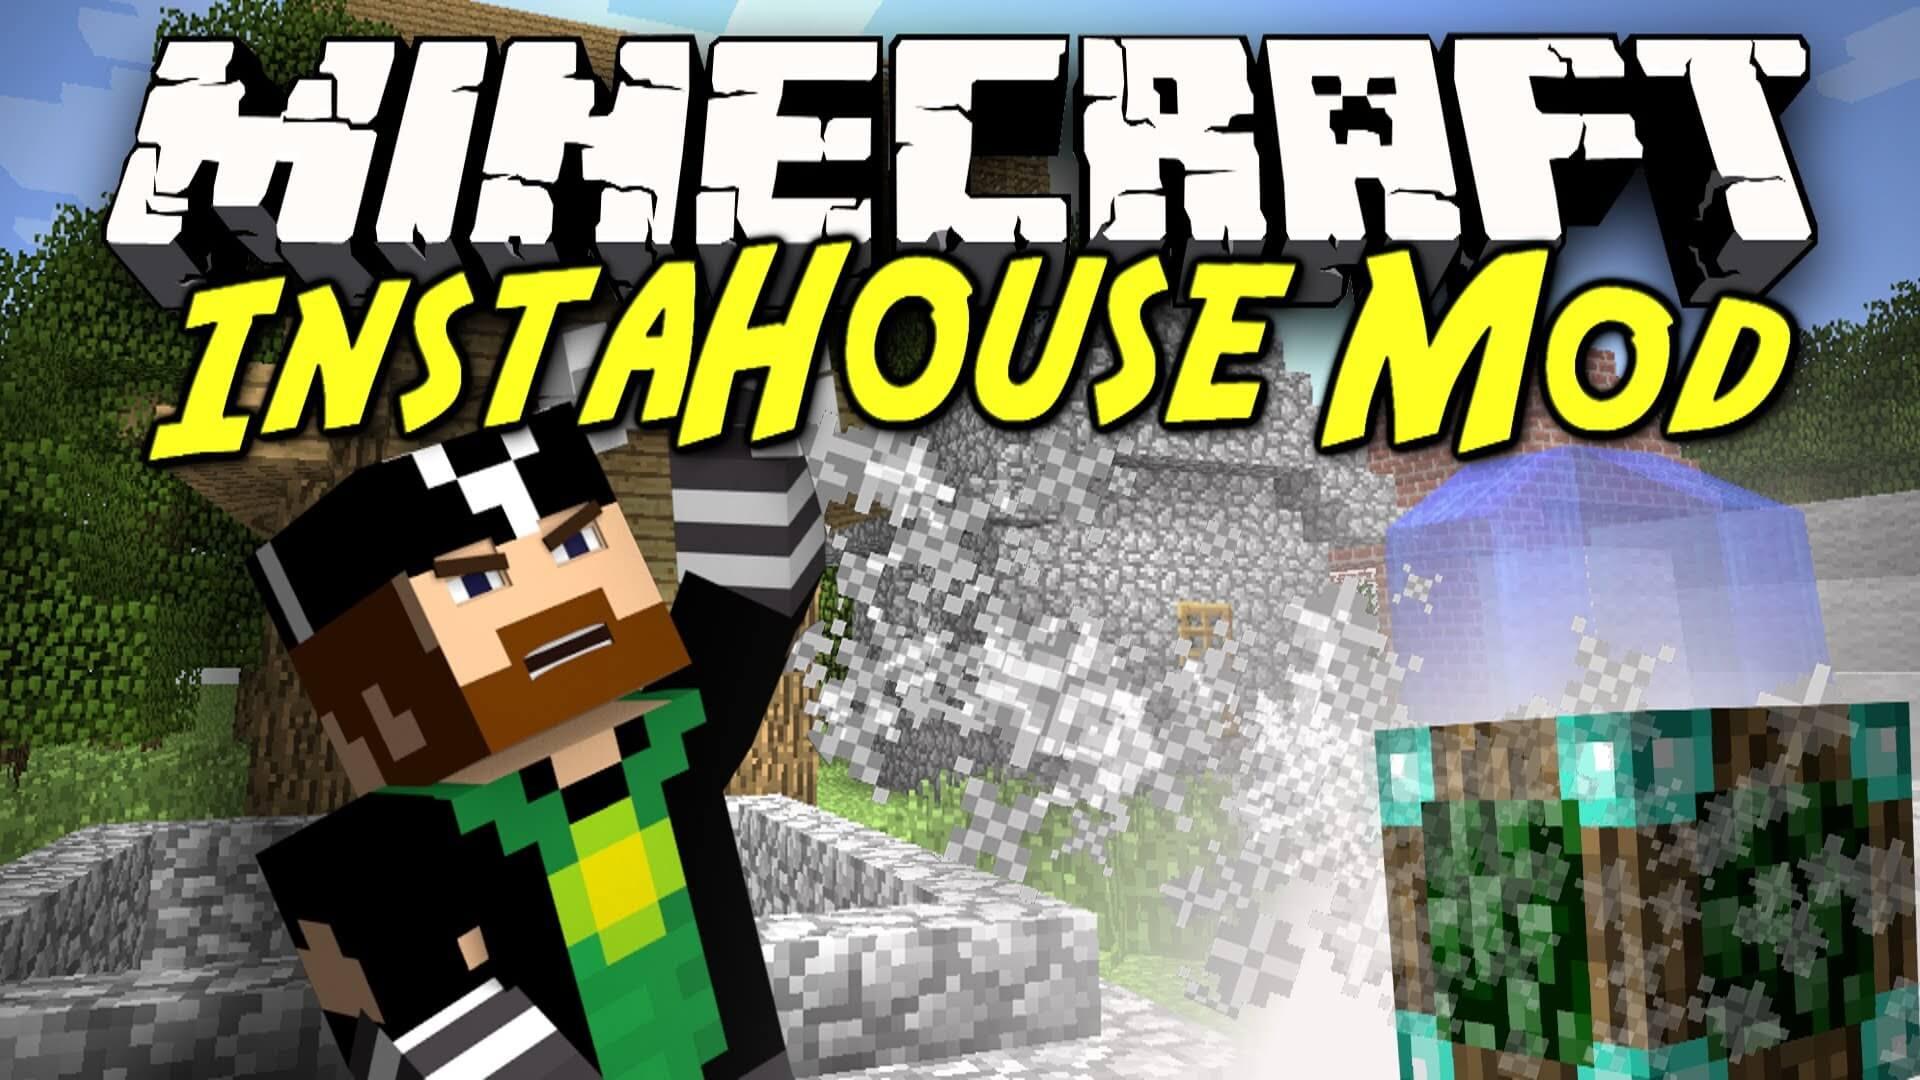 Insta-House-Mod.jpg